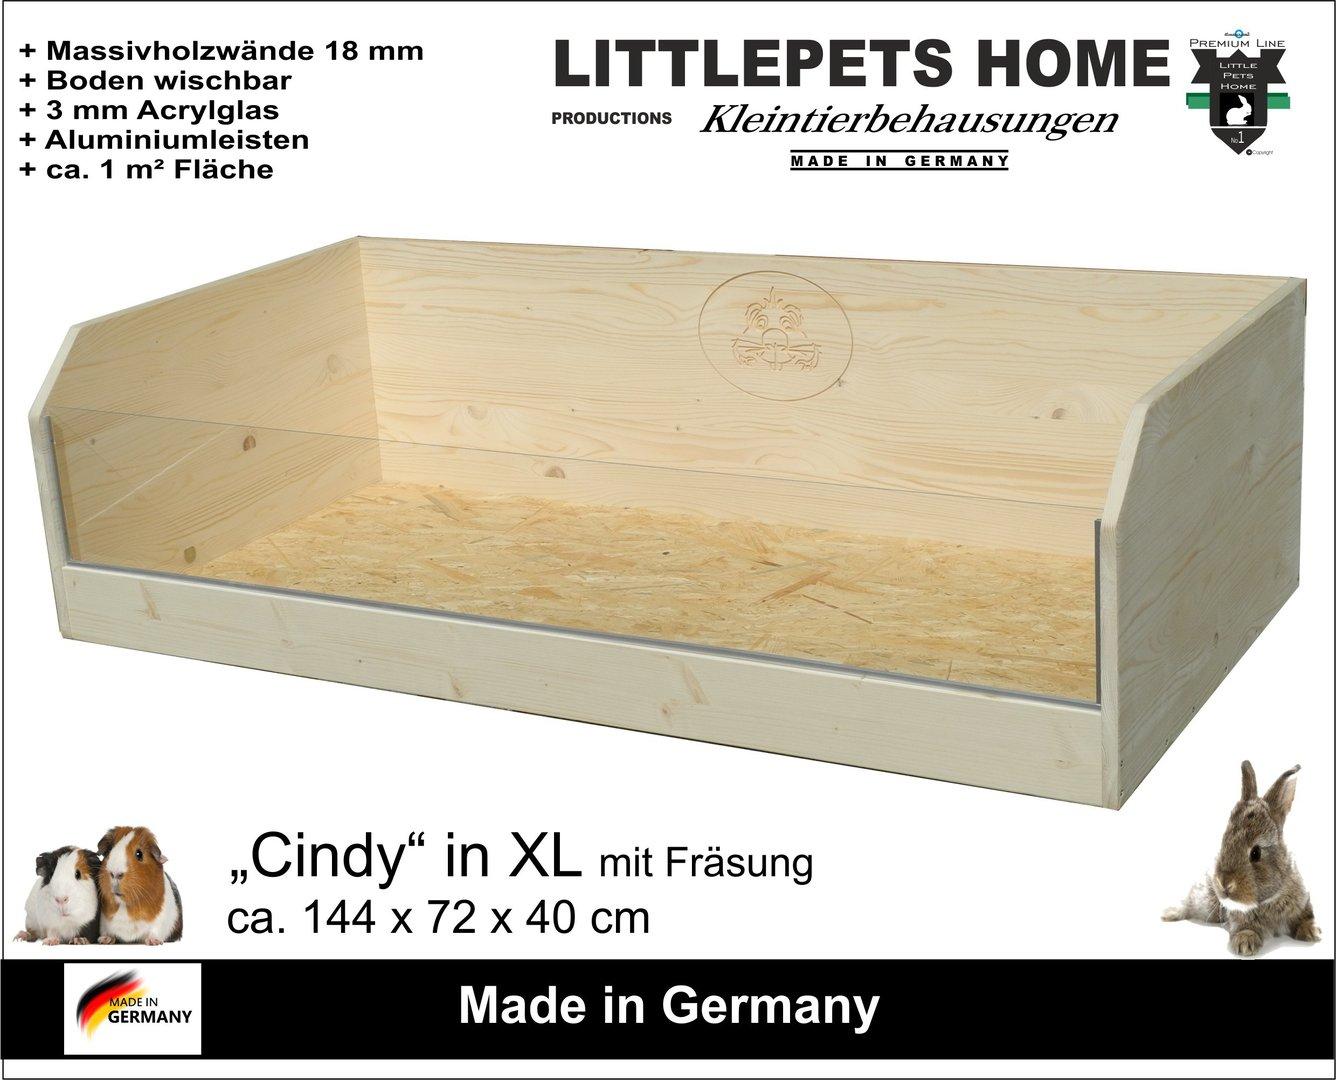 meerschweinchengehege cindy hasengehege kleintiergehege. Black Bedroom Furniture Sets. Home Design Ideas